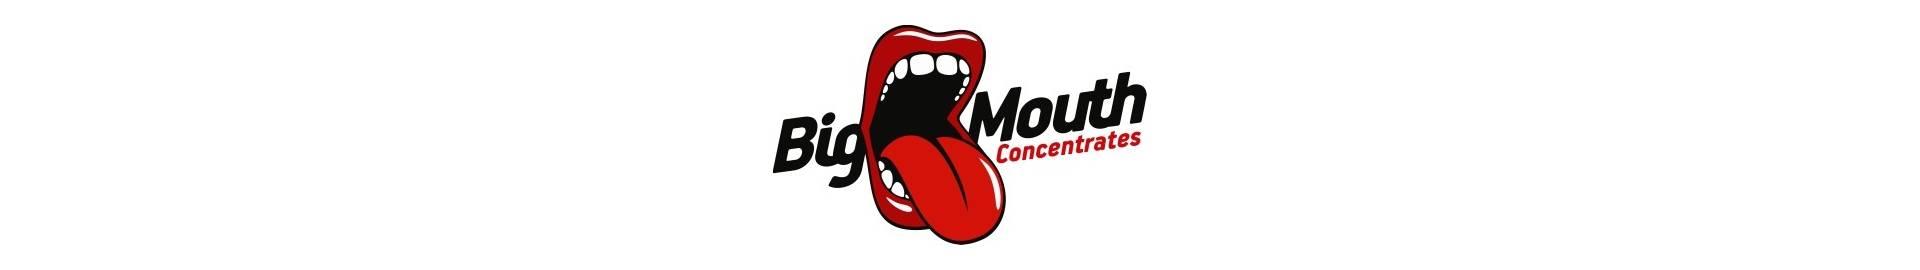 Big Mouth aroma  | Royalsmoke.co.uk